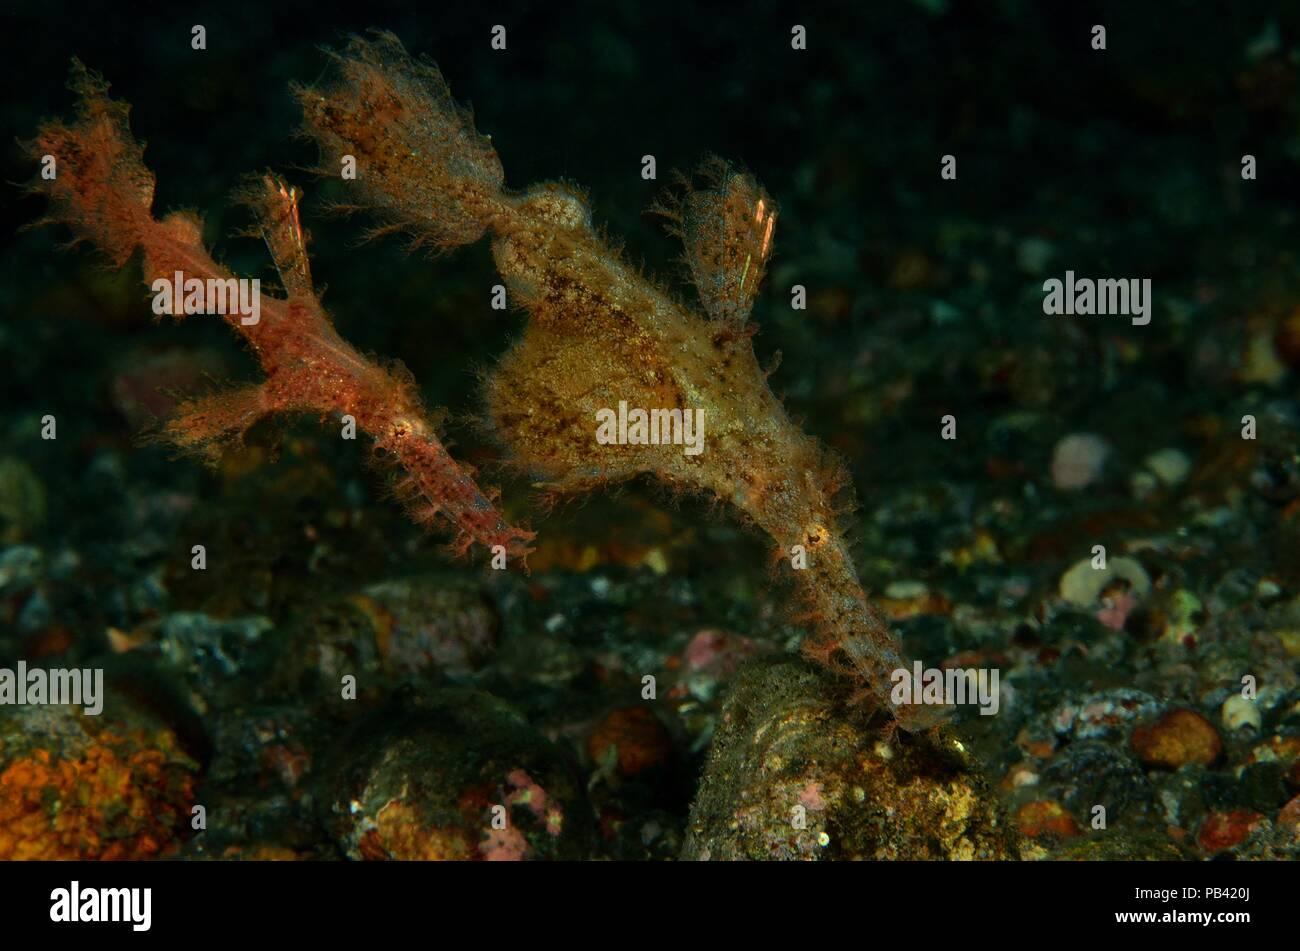 roughsnout ghost pipefisch, Geisterpfeifenfisch, Solenostomus paegnius, Tulamben, Bali, Southeast Asia, Südostasien - Stock Image